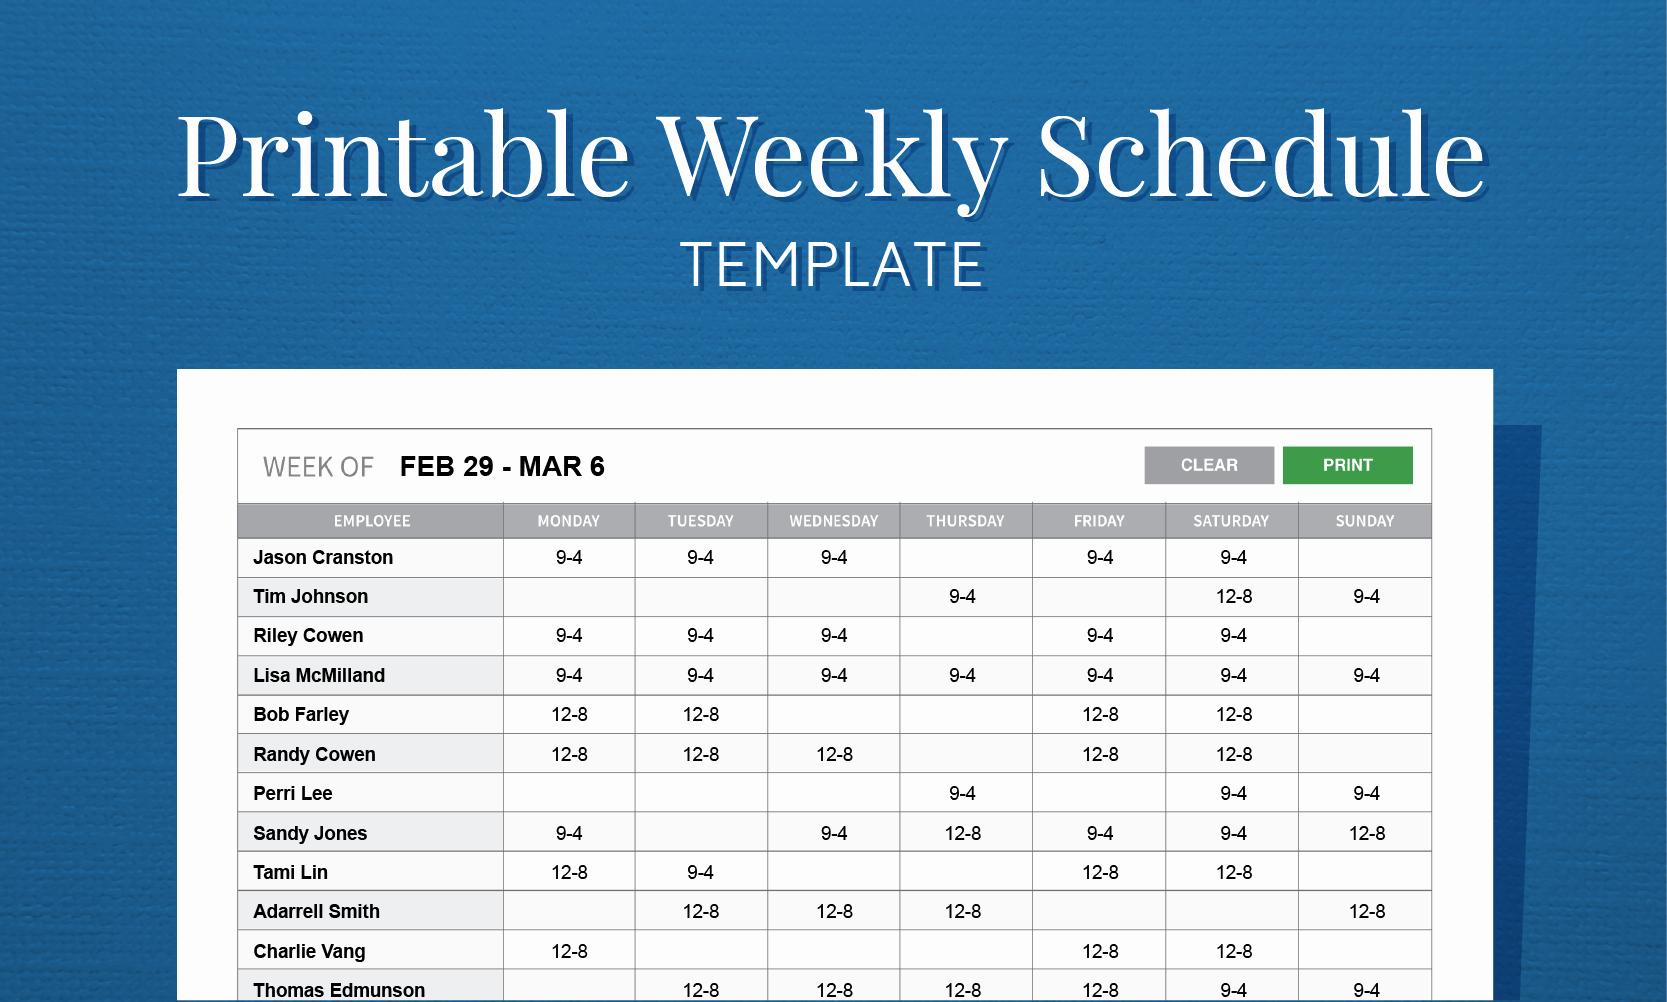 Weekly Employee Schedule Template Excel Fresh Free Printable Work Schedule Template for Employee